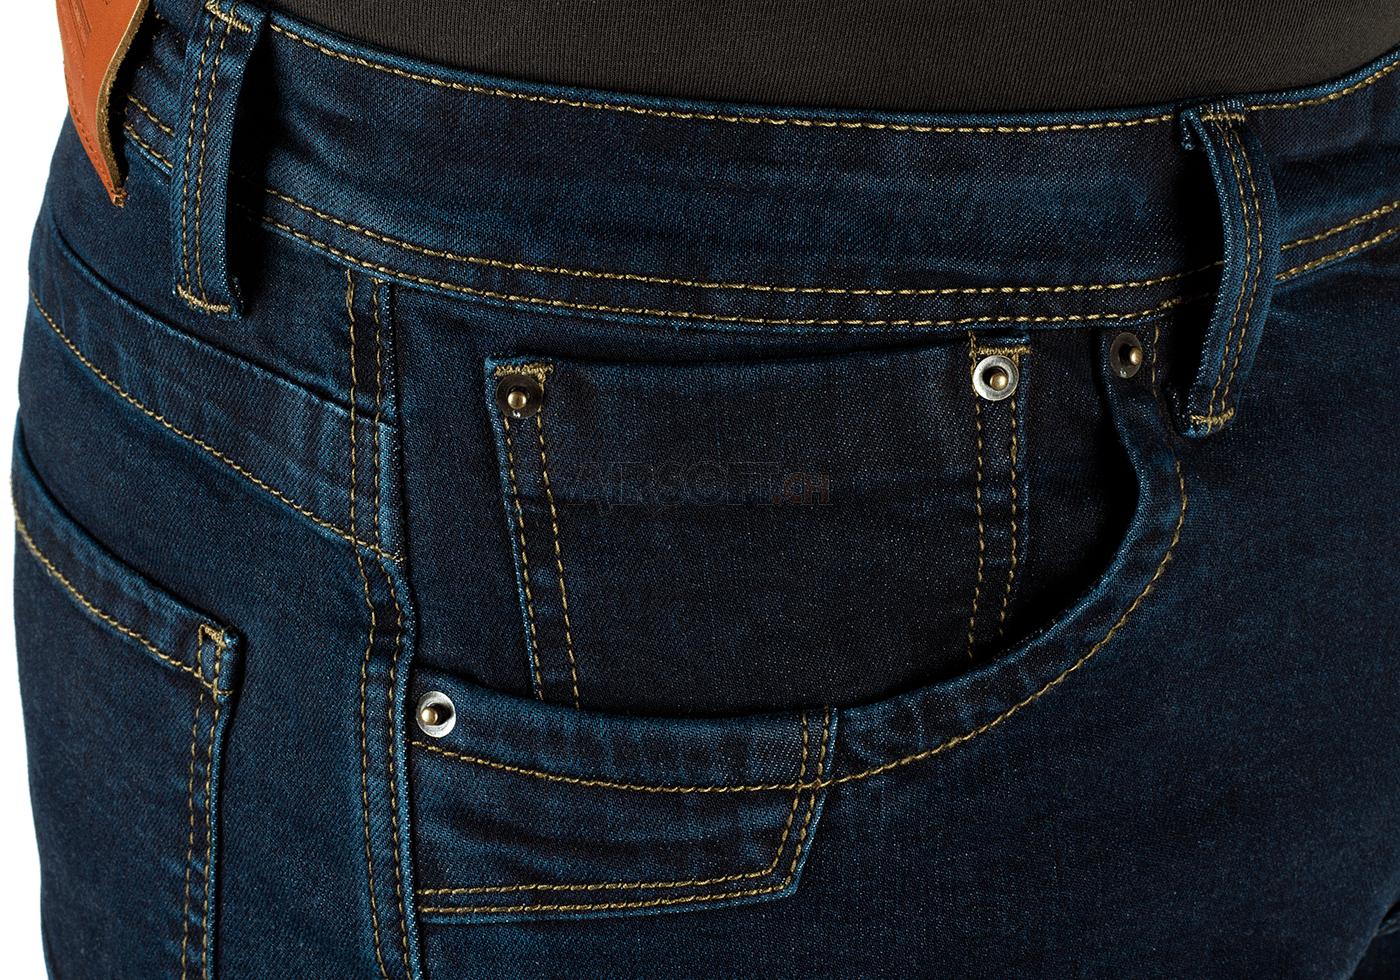 cef71e3da869 Blue Denim Tactical Flex Jeans Midnight (Clawgear) 29/32 - Jeans - Pants -  Garments - airsoft.ch Online shop